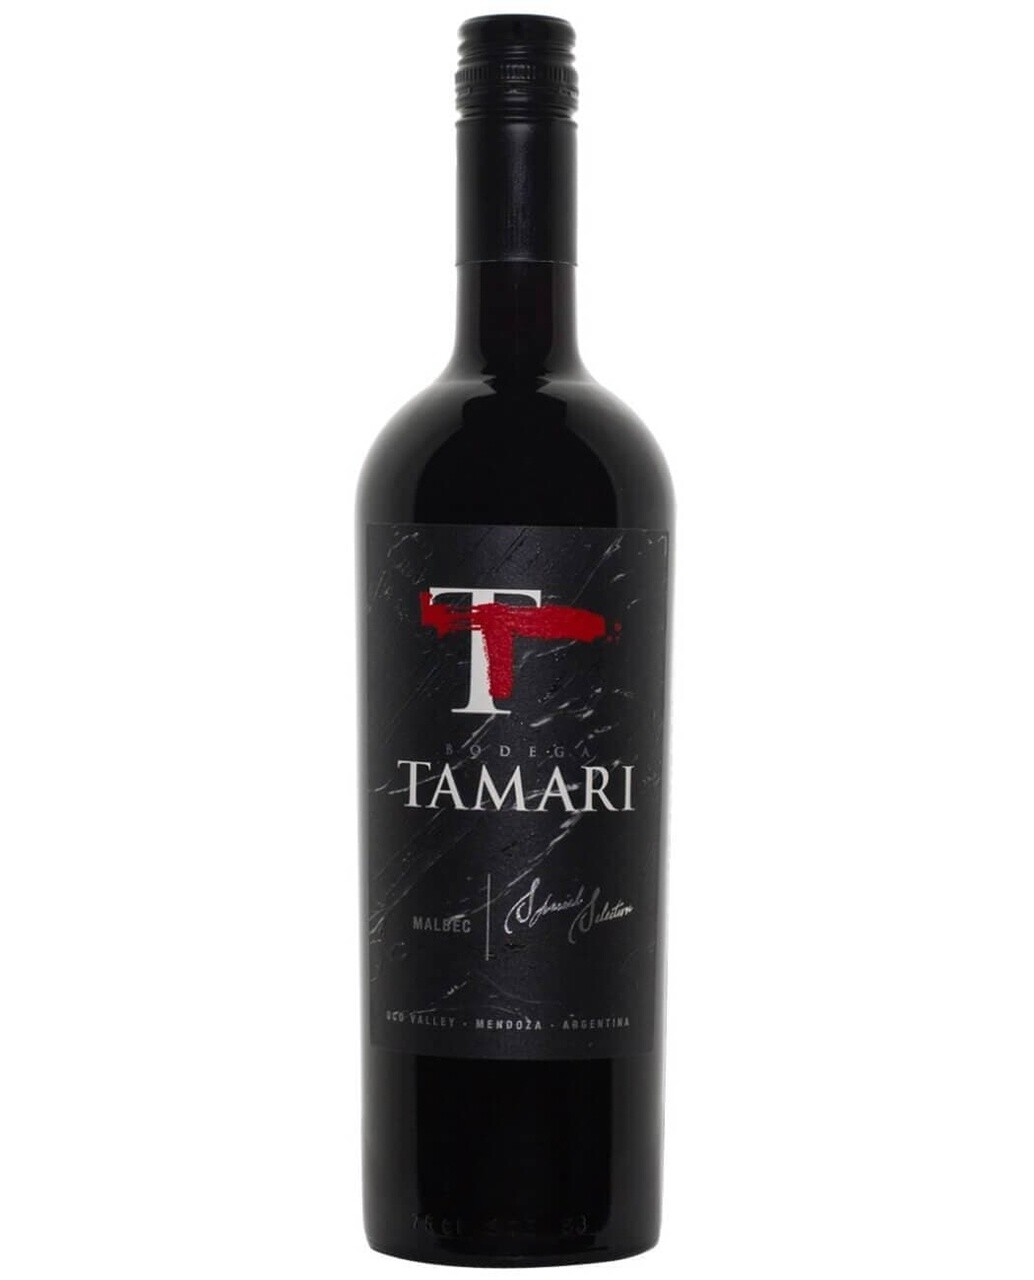 Tamari Special Selection Malbec